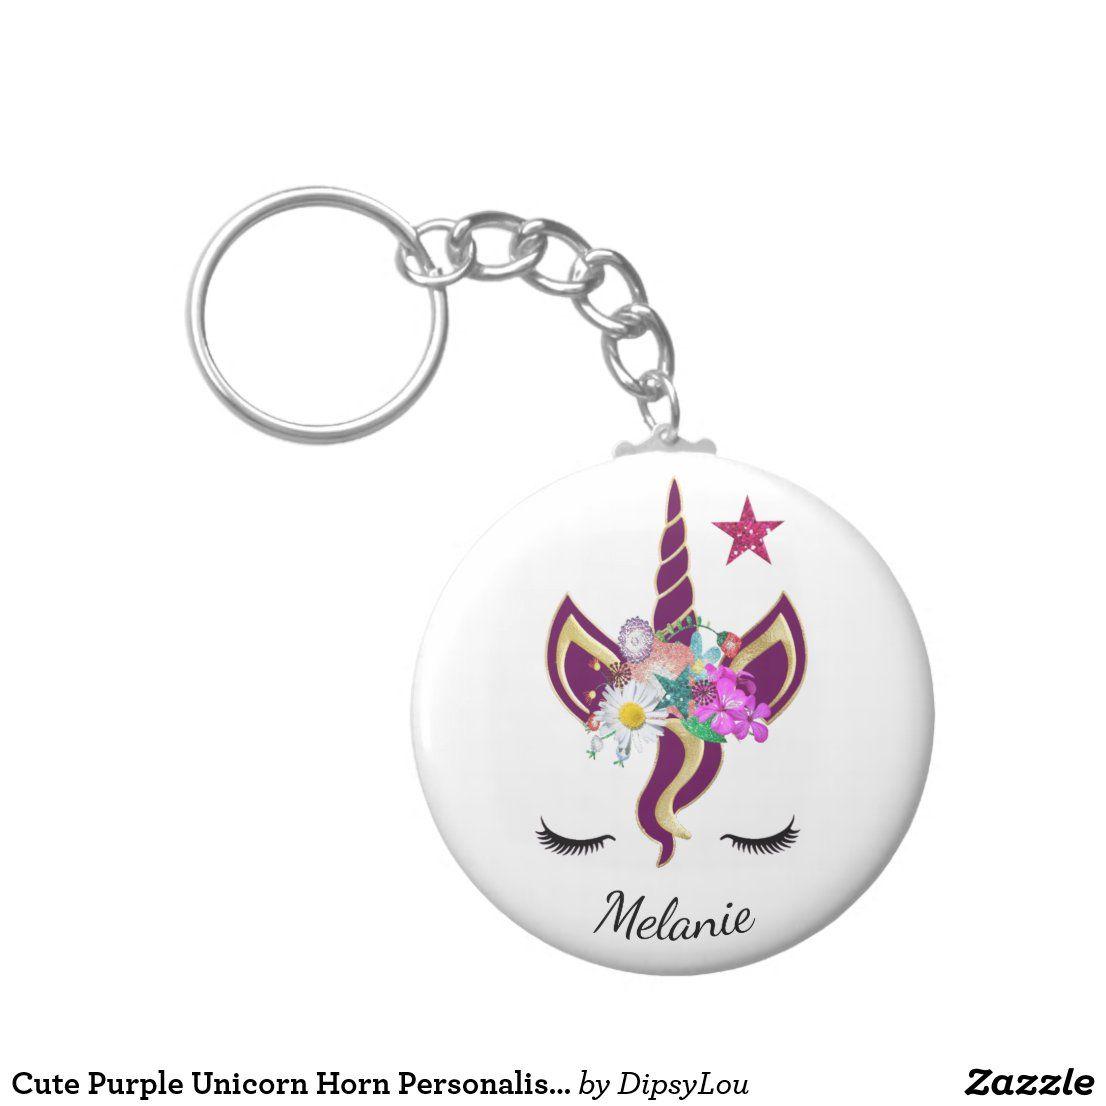 Cute Purple Unicorn Horn Personalised Keychain   Zazzle.com